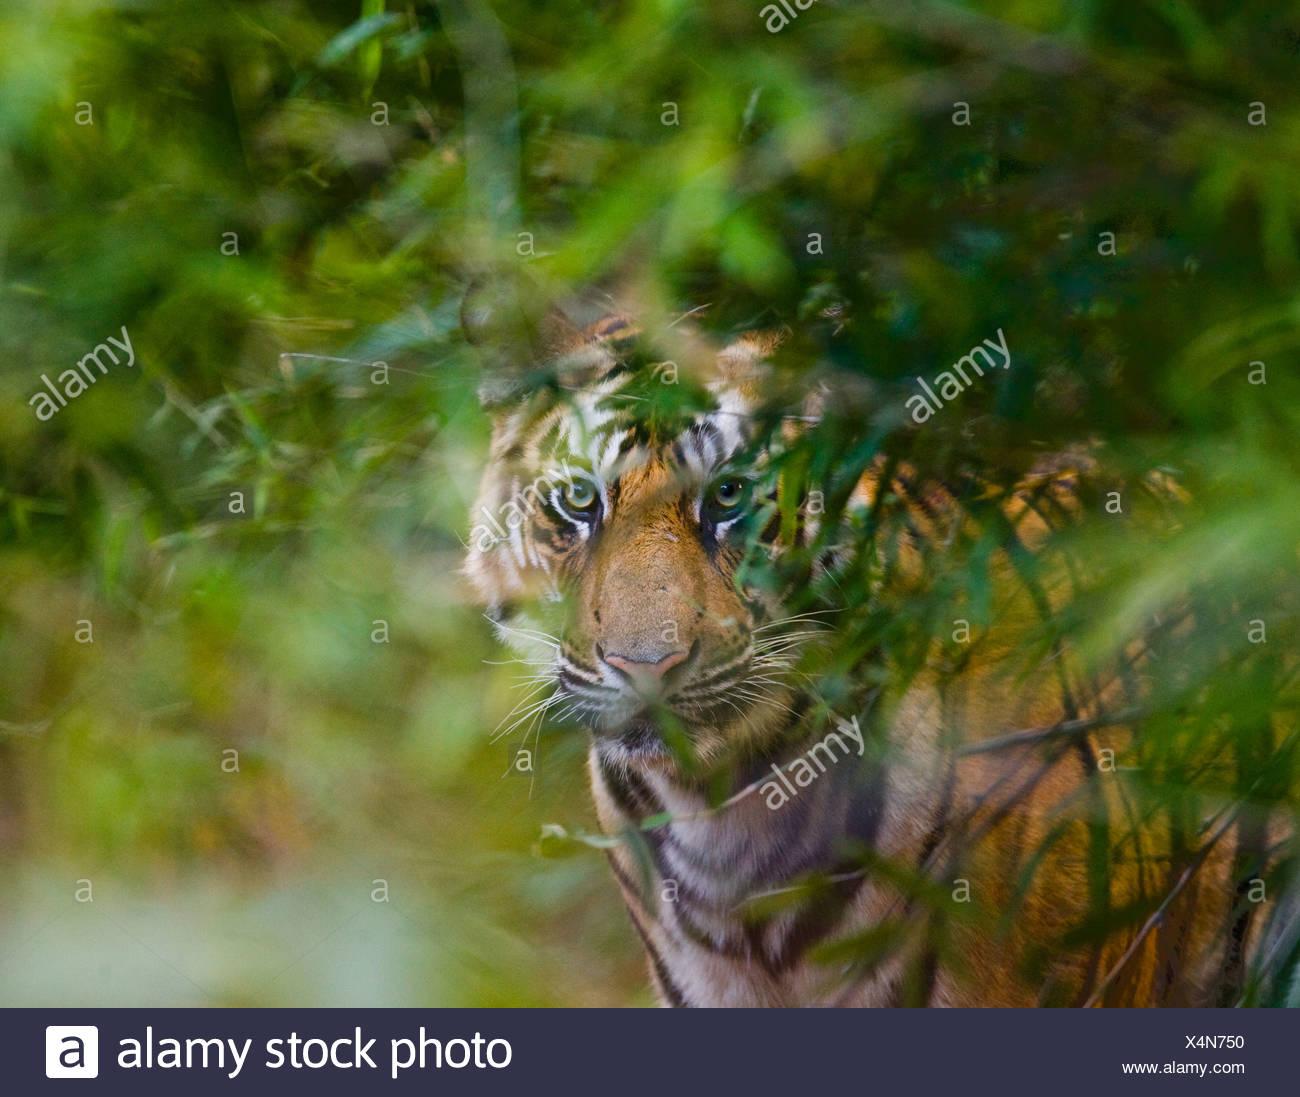 Tigre indio, Parque Nacional Bandhavgarh, India (Panthera tigris) Imagen De Stock